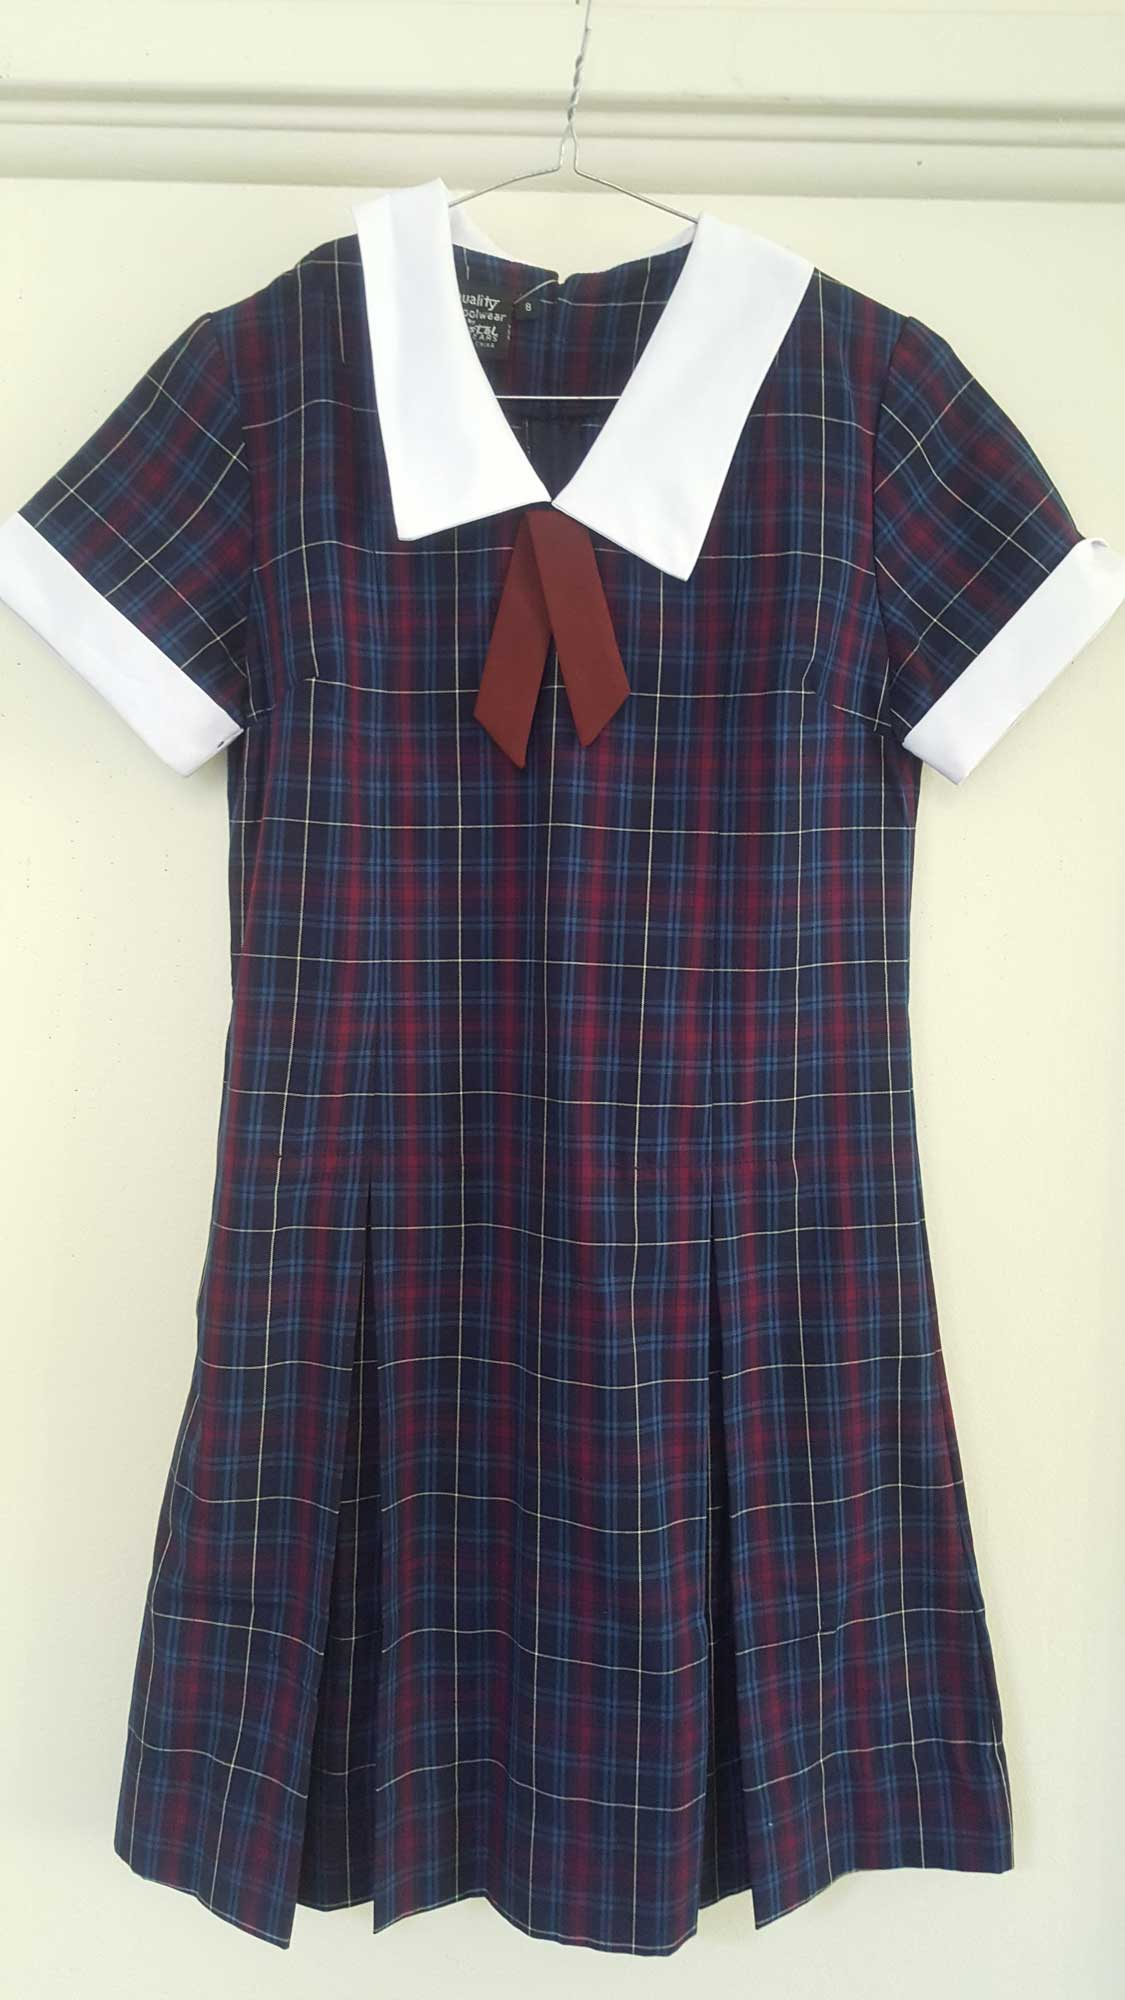 Senior tunic